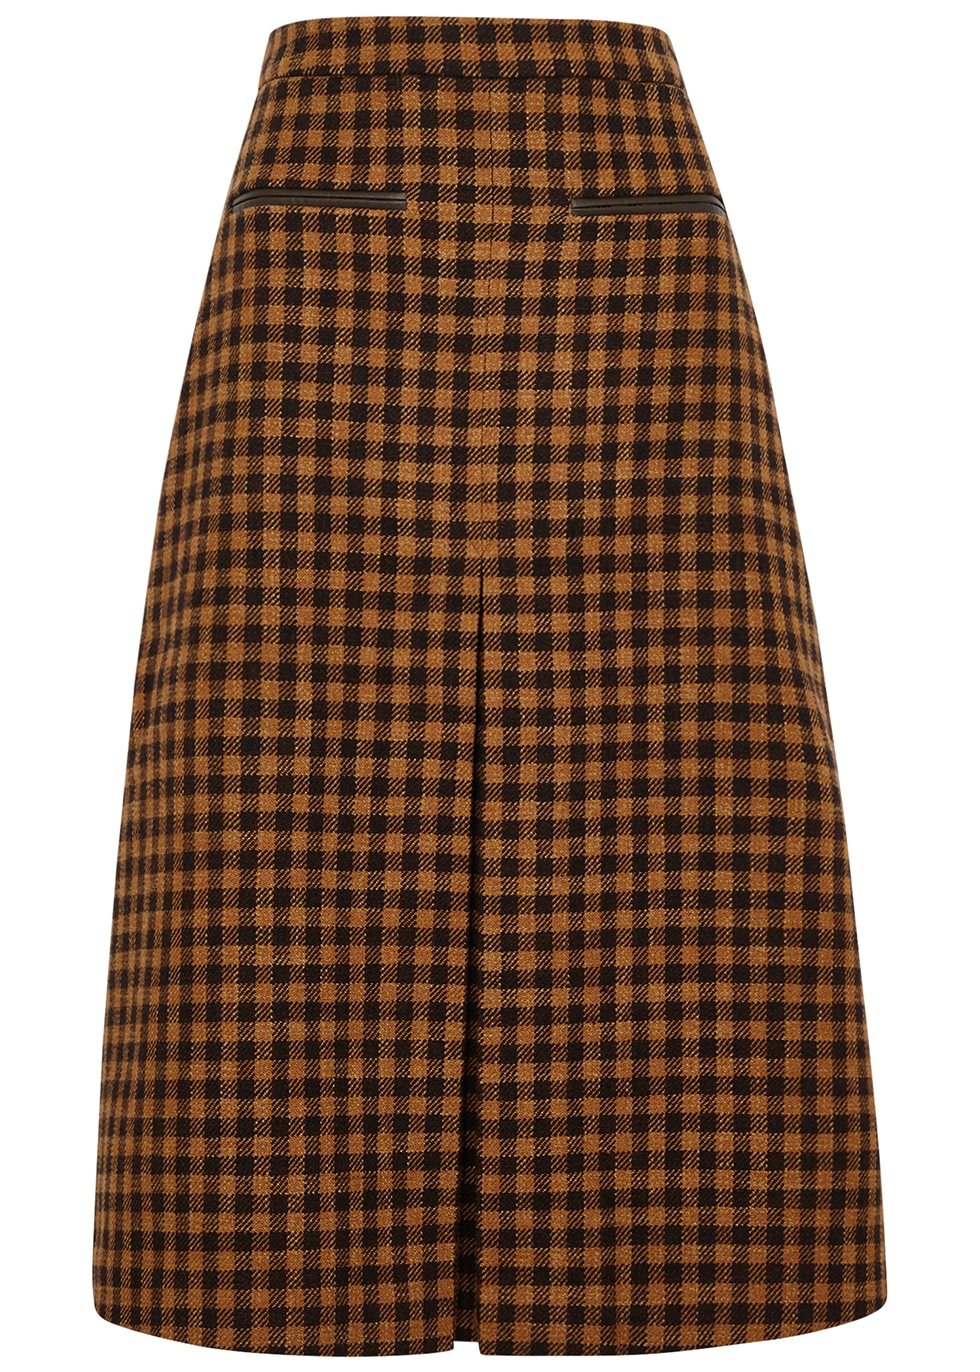 Hazel checked wool-blend skirt